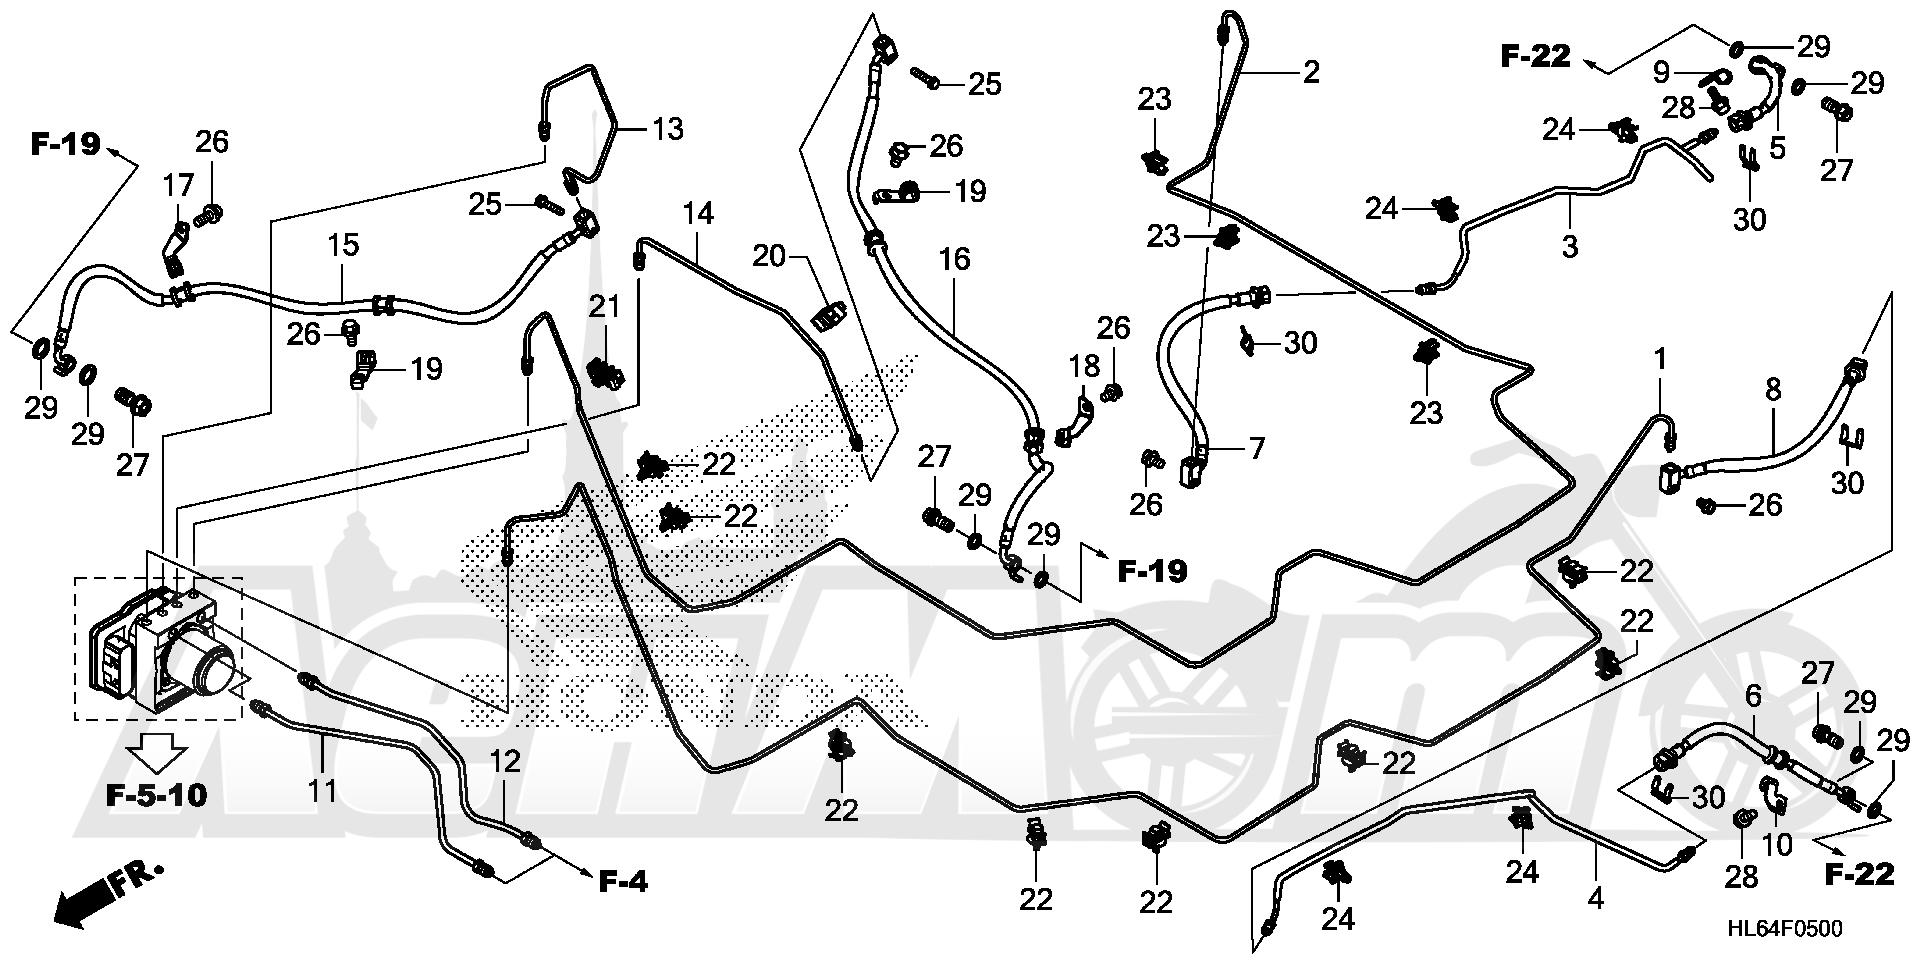 Запчасти для Квадроцикла Honda 2019 SXS1000S2R Раздел: BRAKE PIPE AND BRAKE HOSE (1) | тормоза труба и тормоза шланг (1)